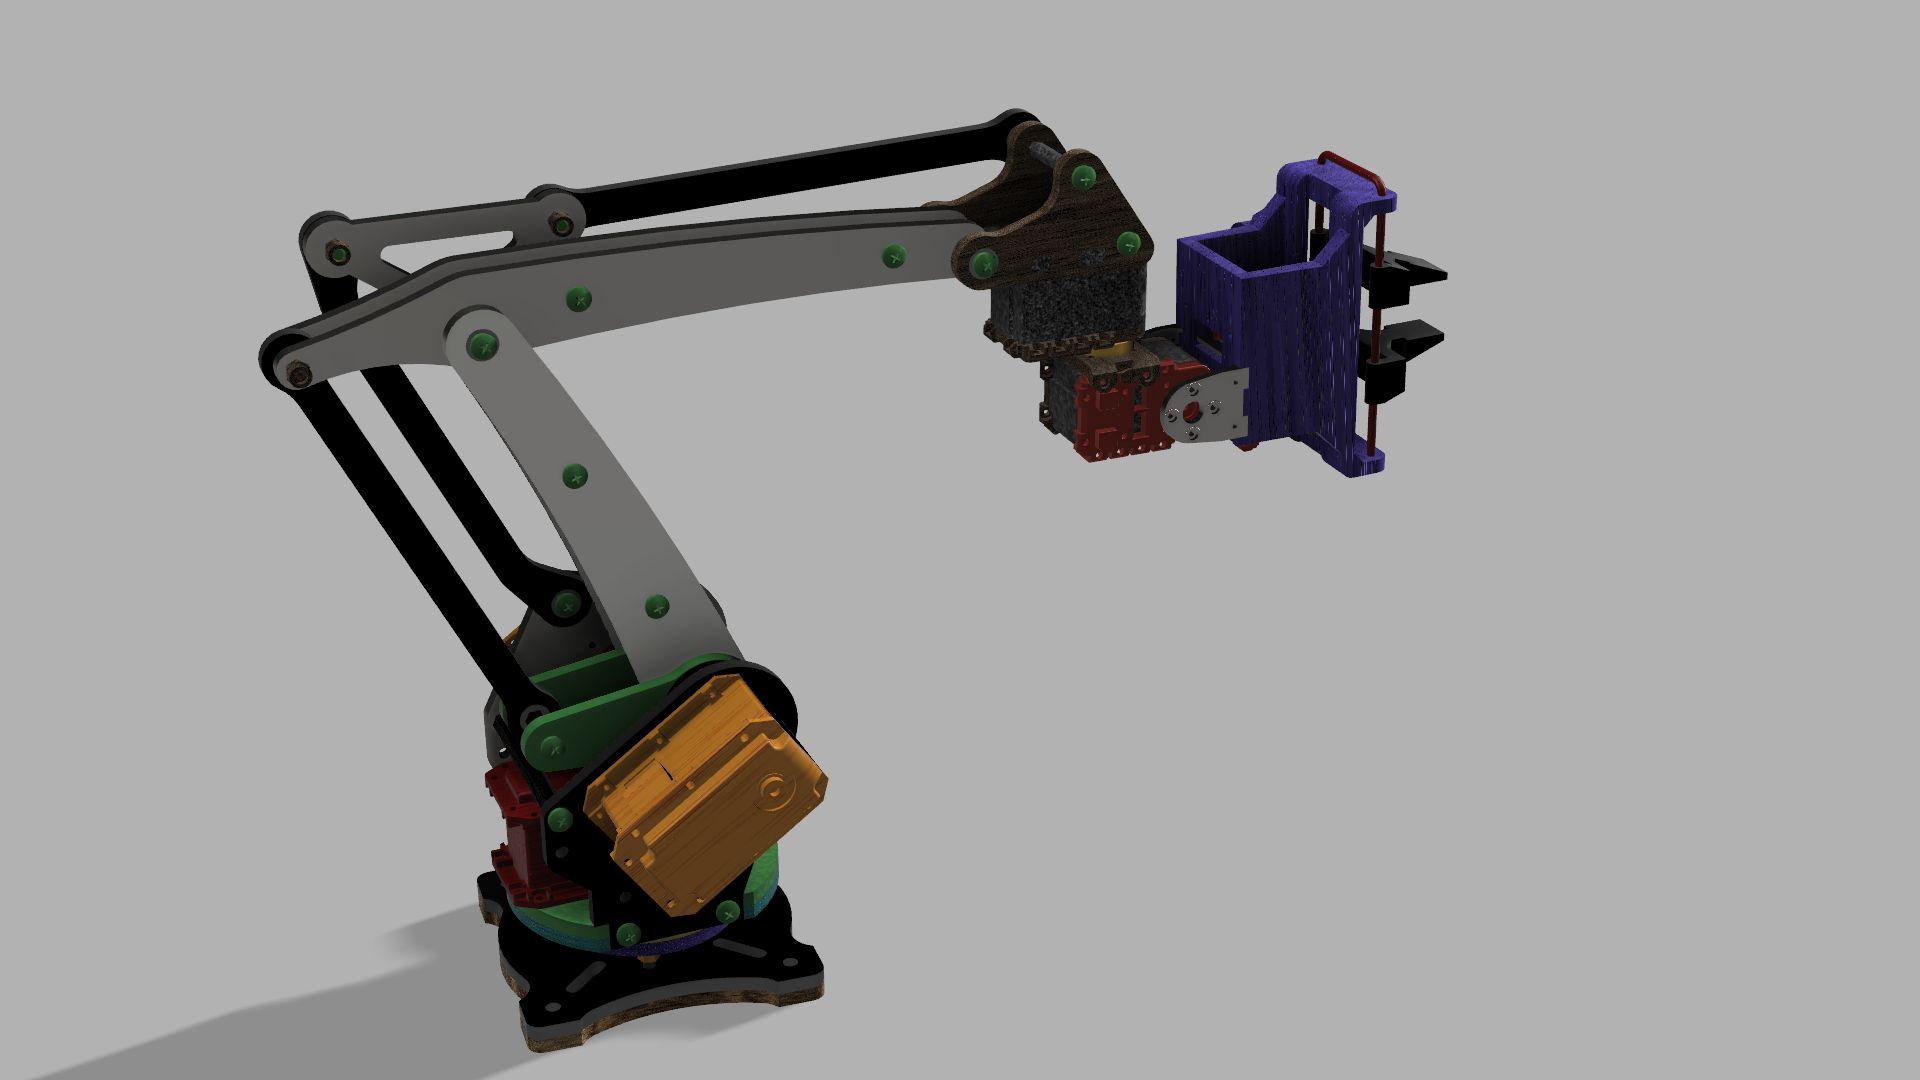 Robotic-crane-02-3500-3500